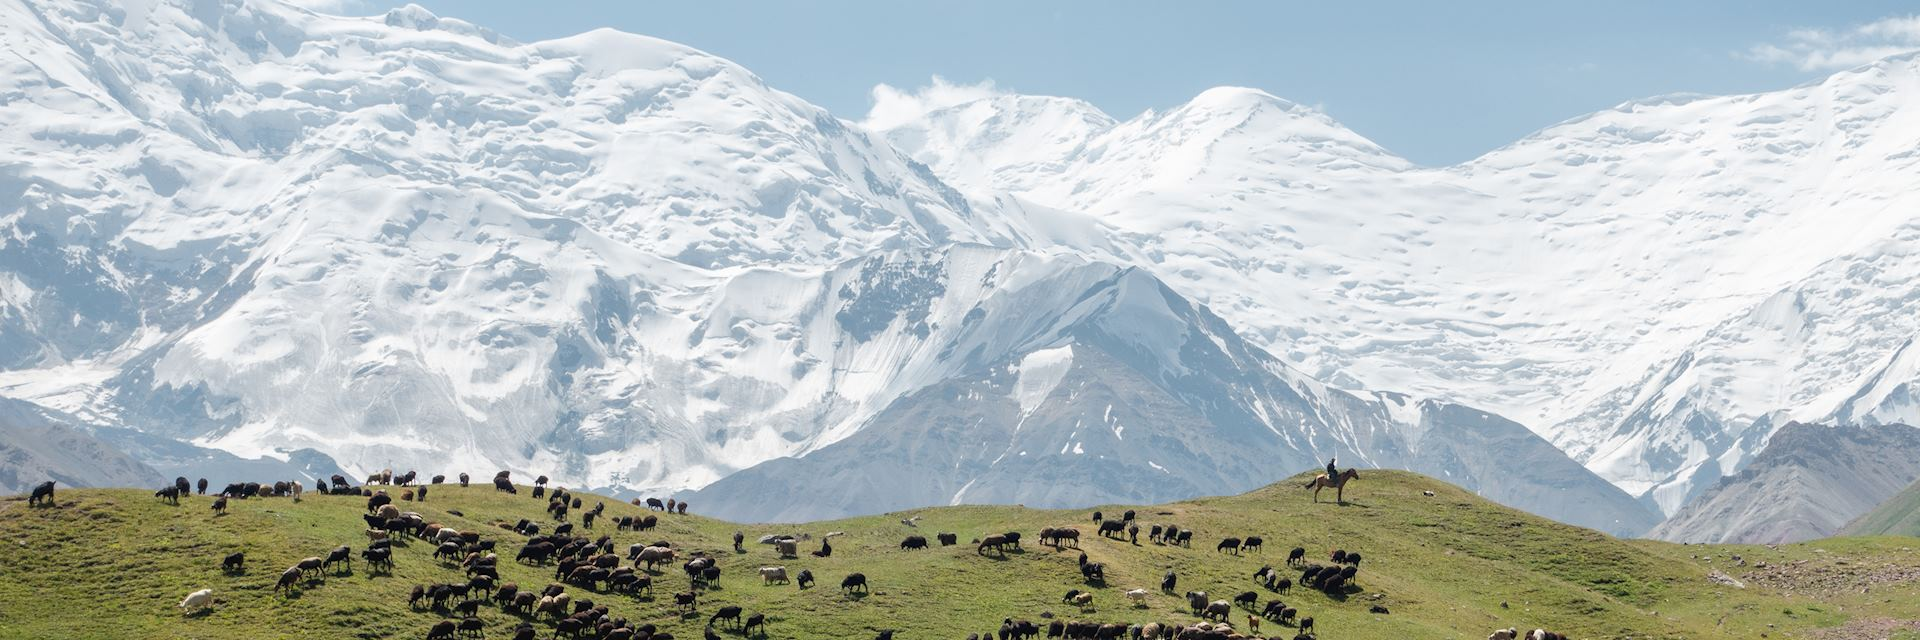 Pamir Mountains in the Osh region